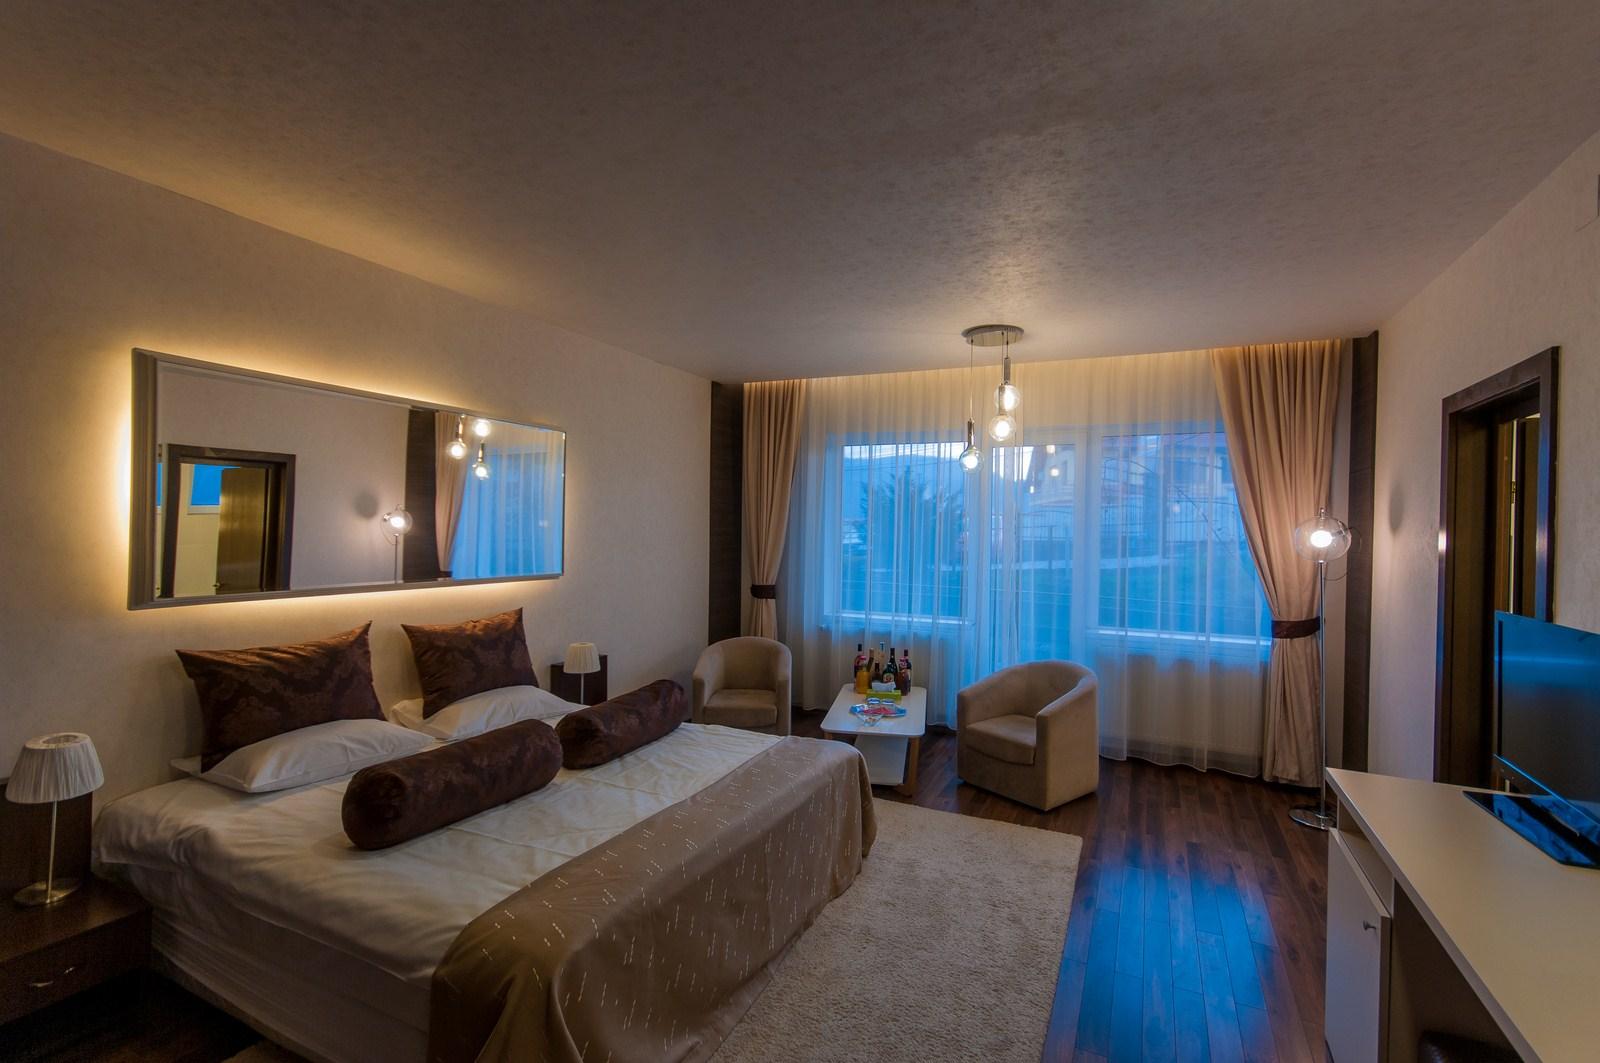 Corpuri de iluminat pentru camera de hotel - Idromassaggio in camera da letto bari ...